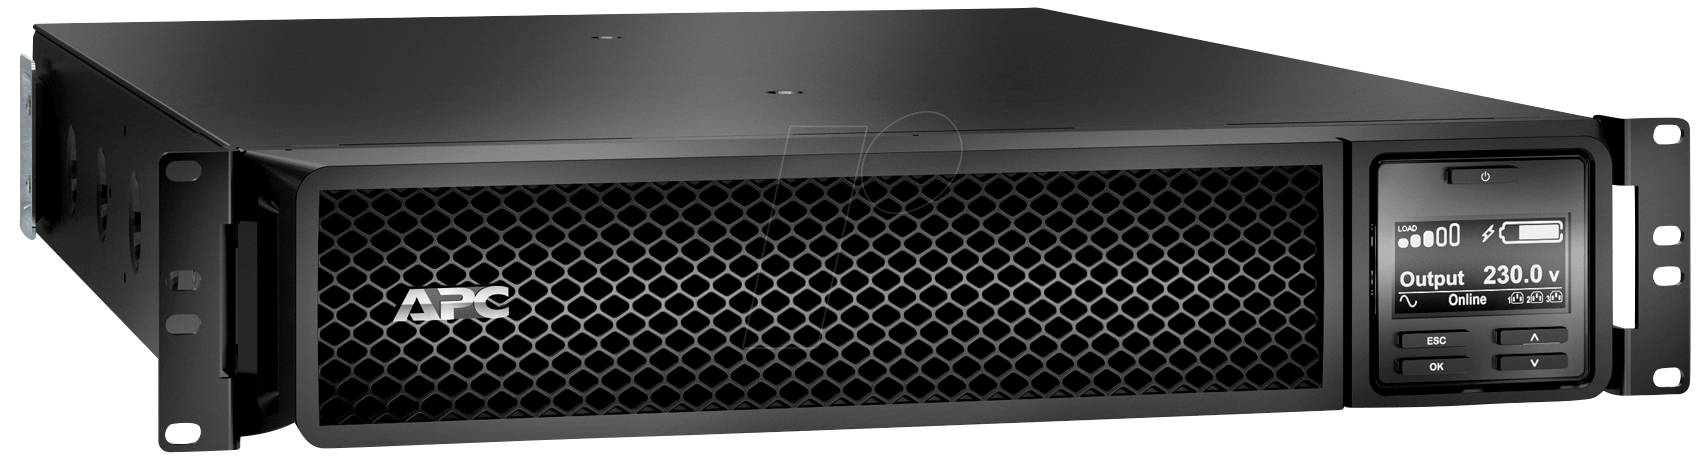 APC SRT2200RMXLI - APC Smart-UPS SRT 2200 VA, Rackmount, 230V